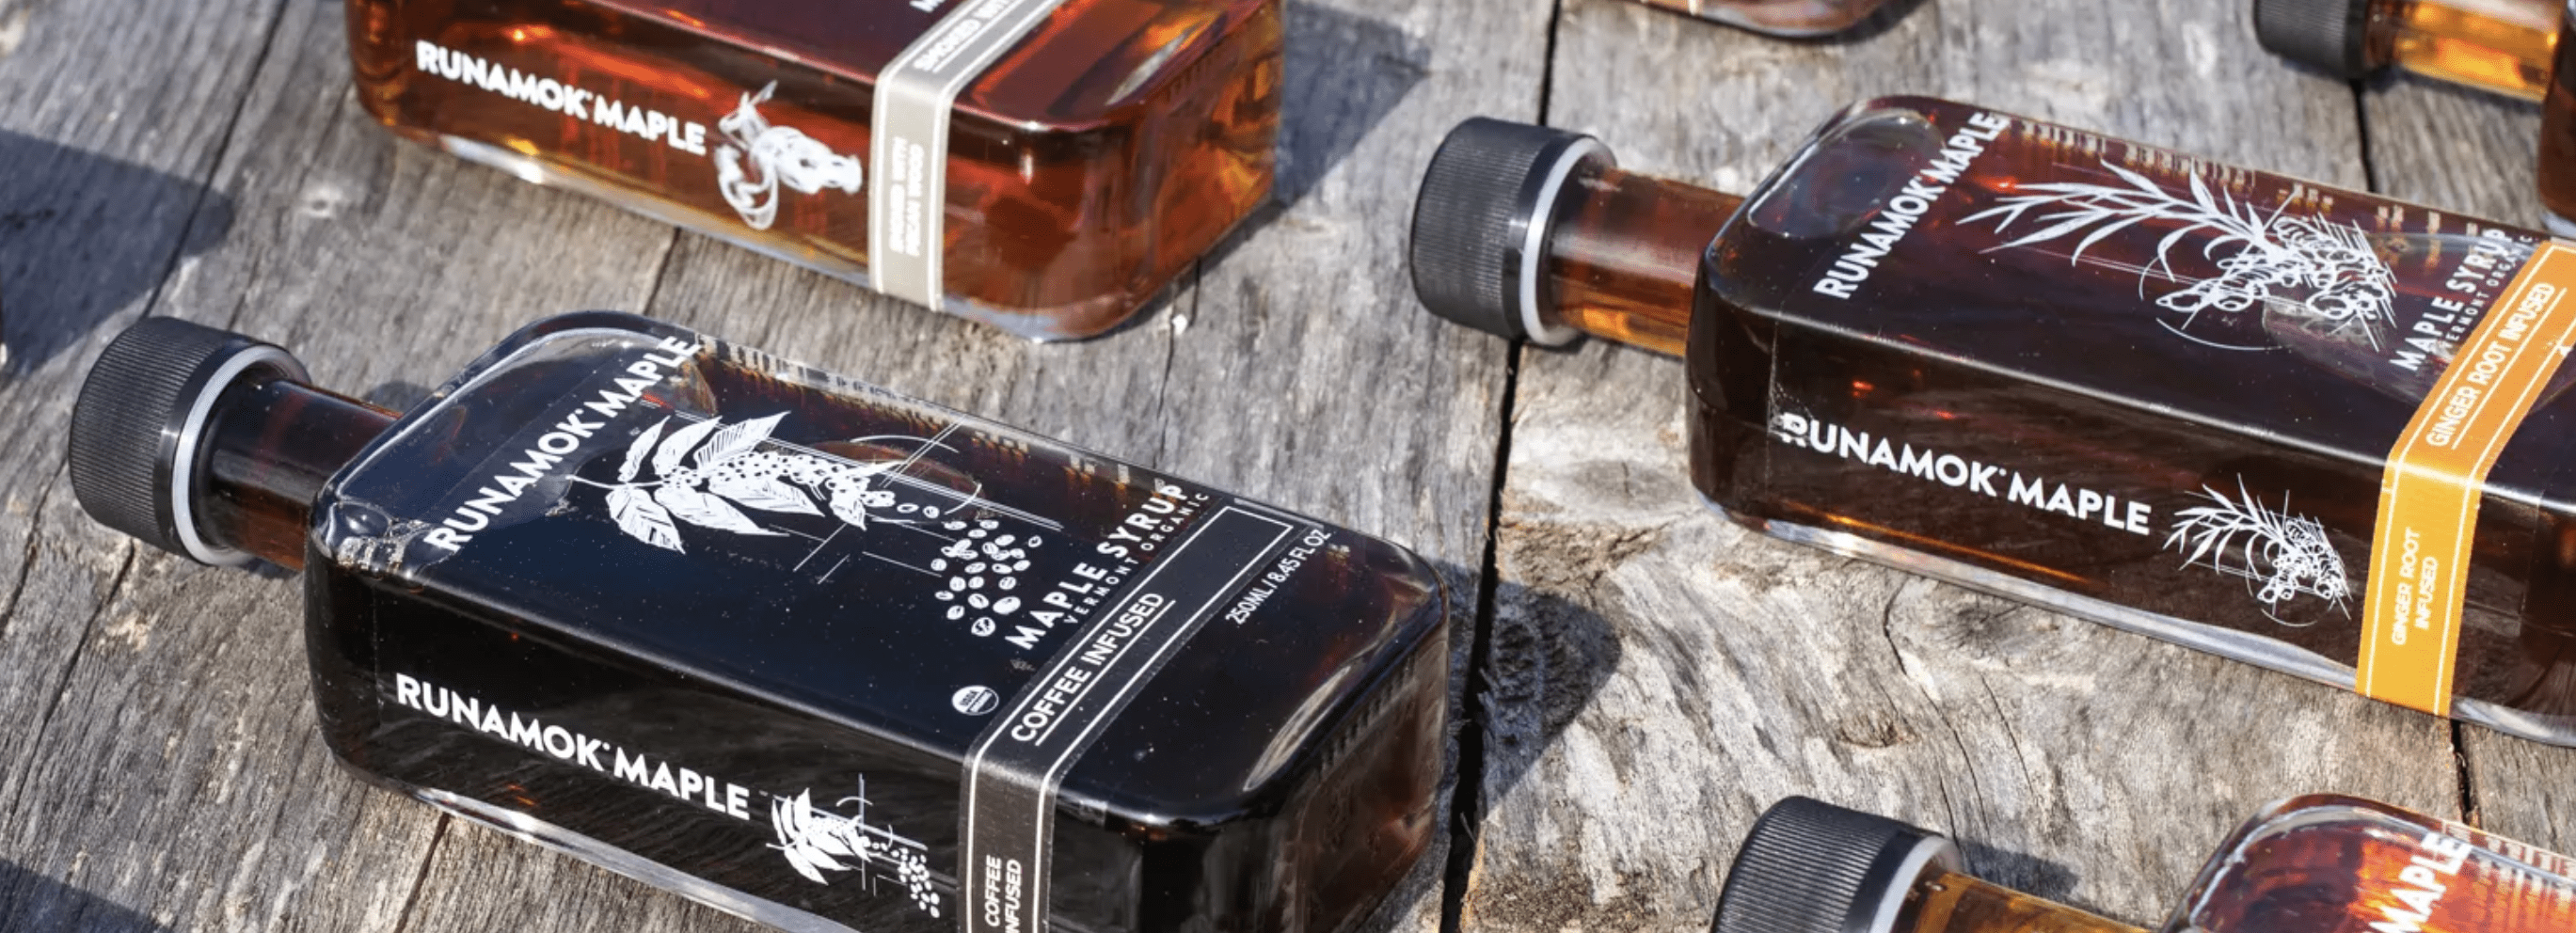 Runamok Infused Maple Syrup